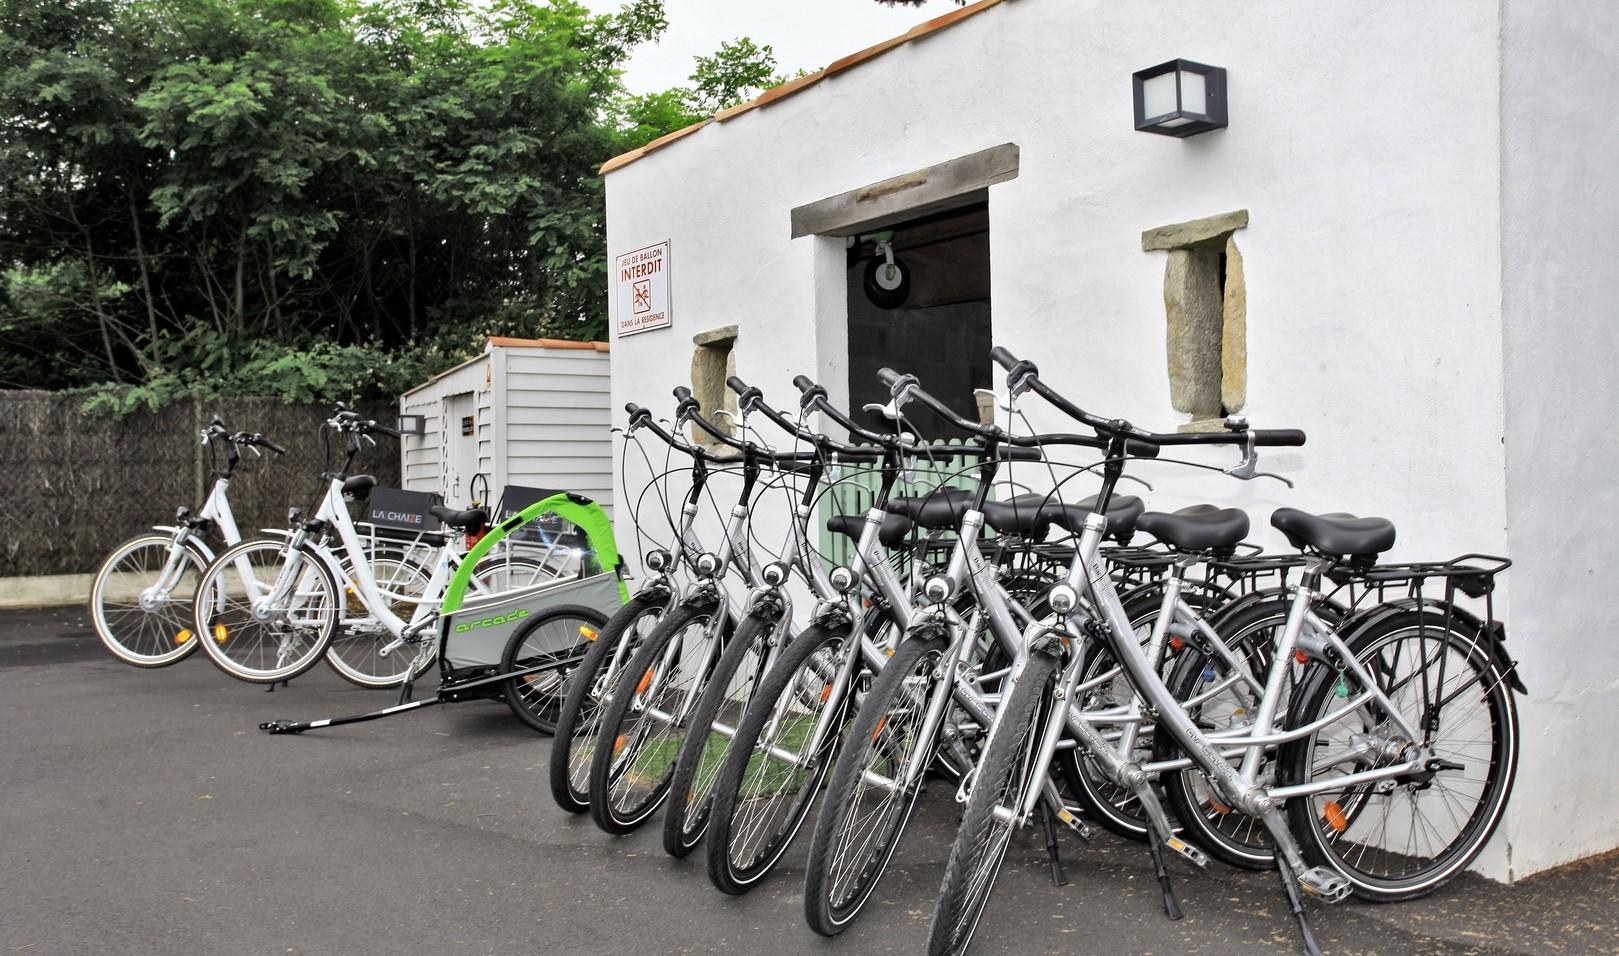 balade à vélo près du camping en Vendée